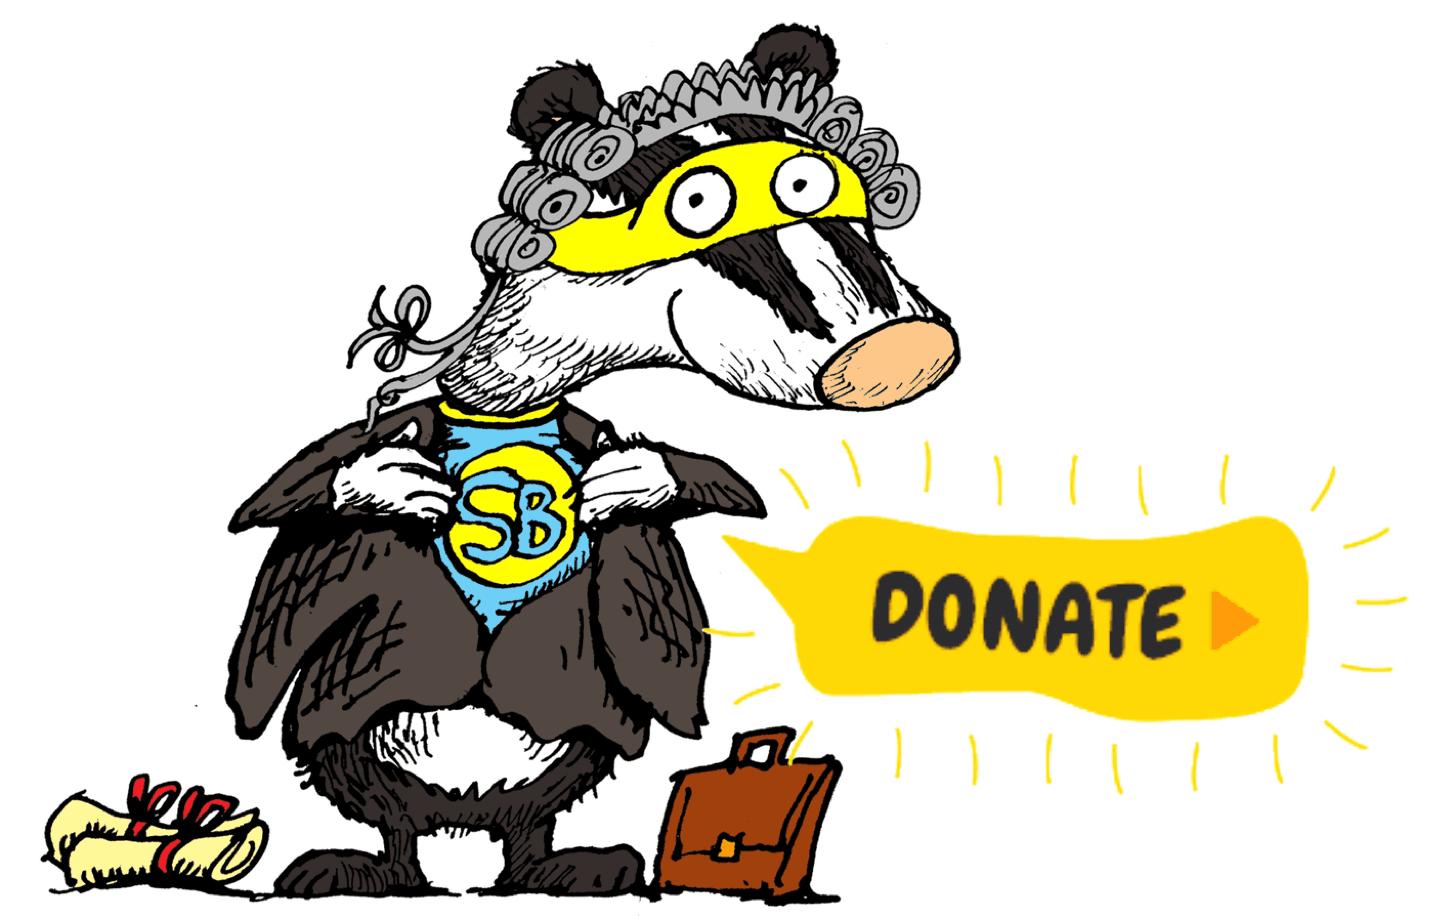 legal donate